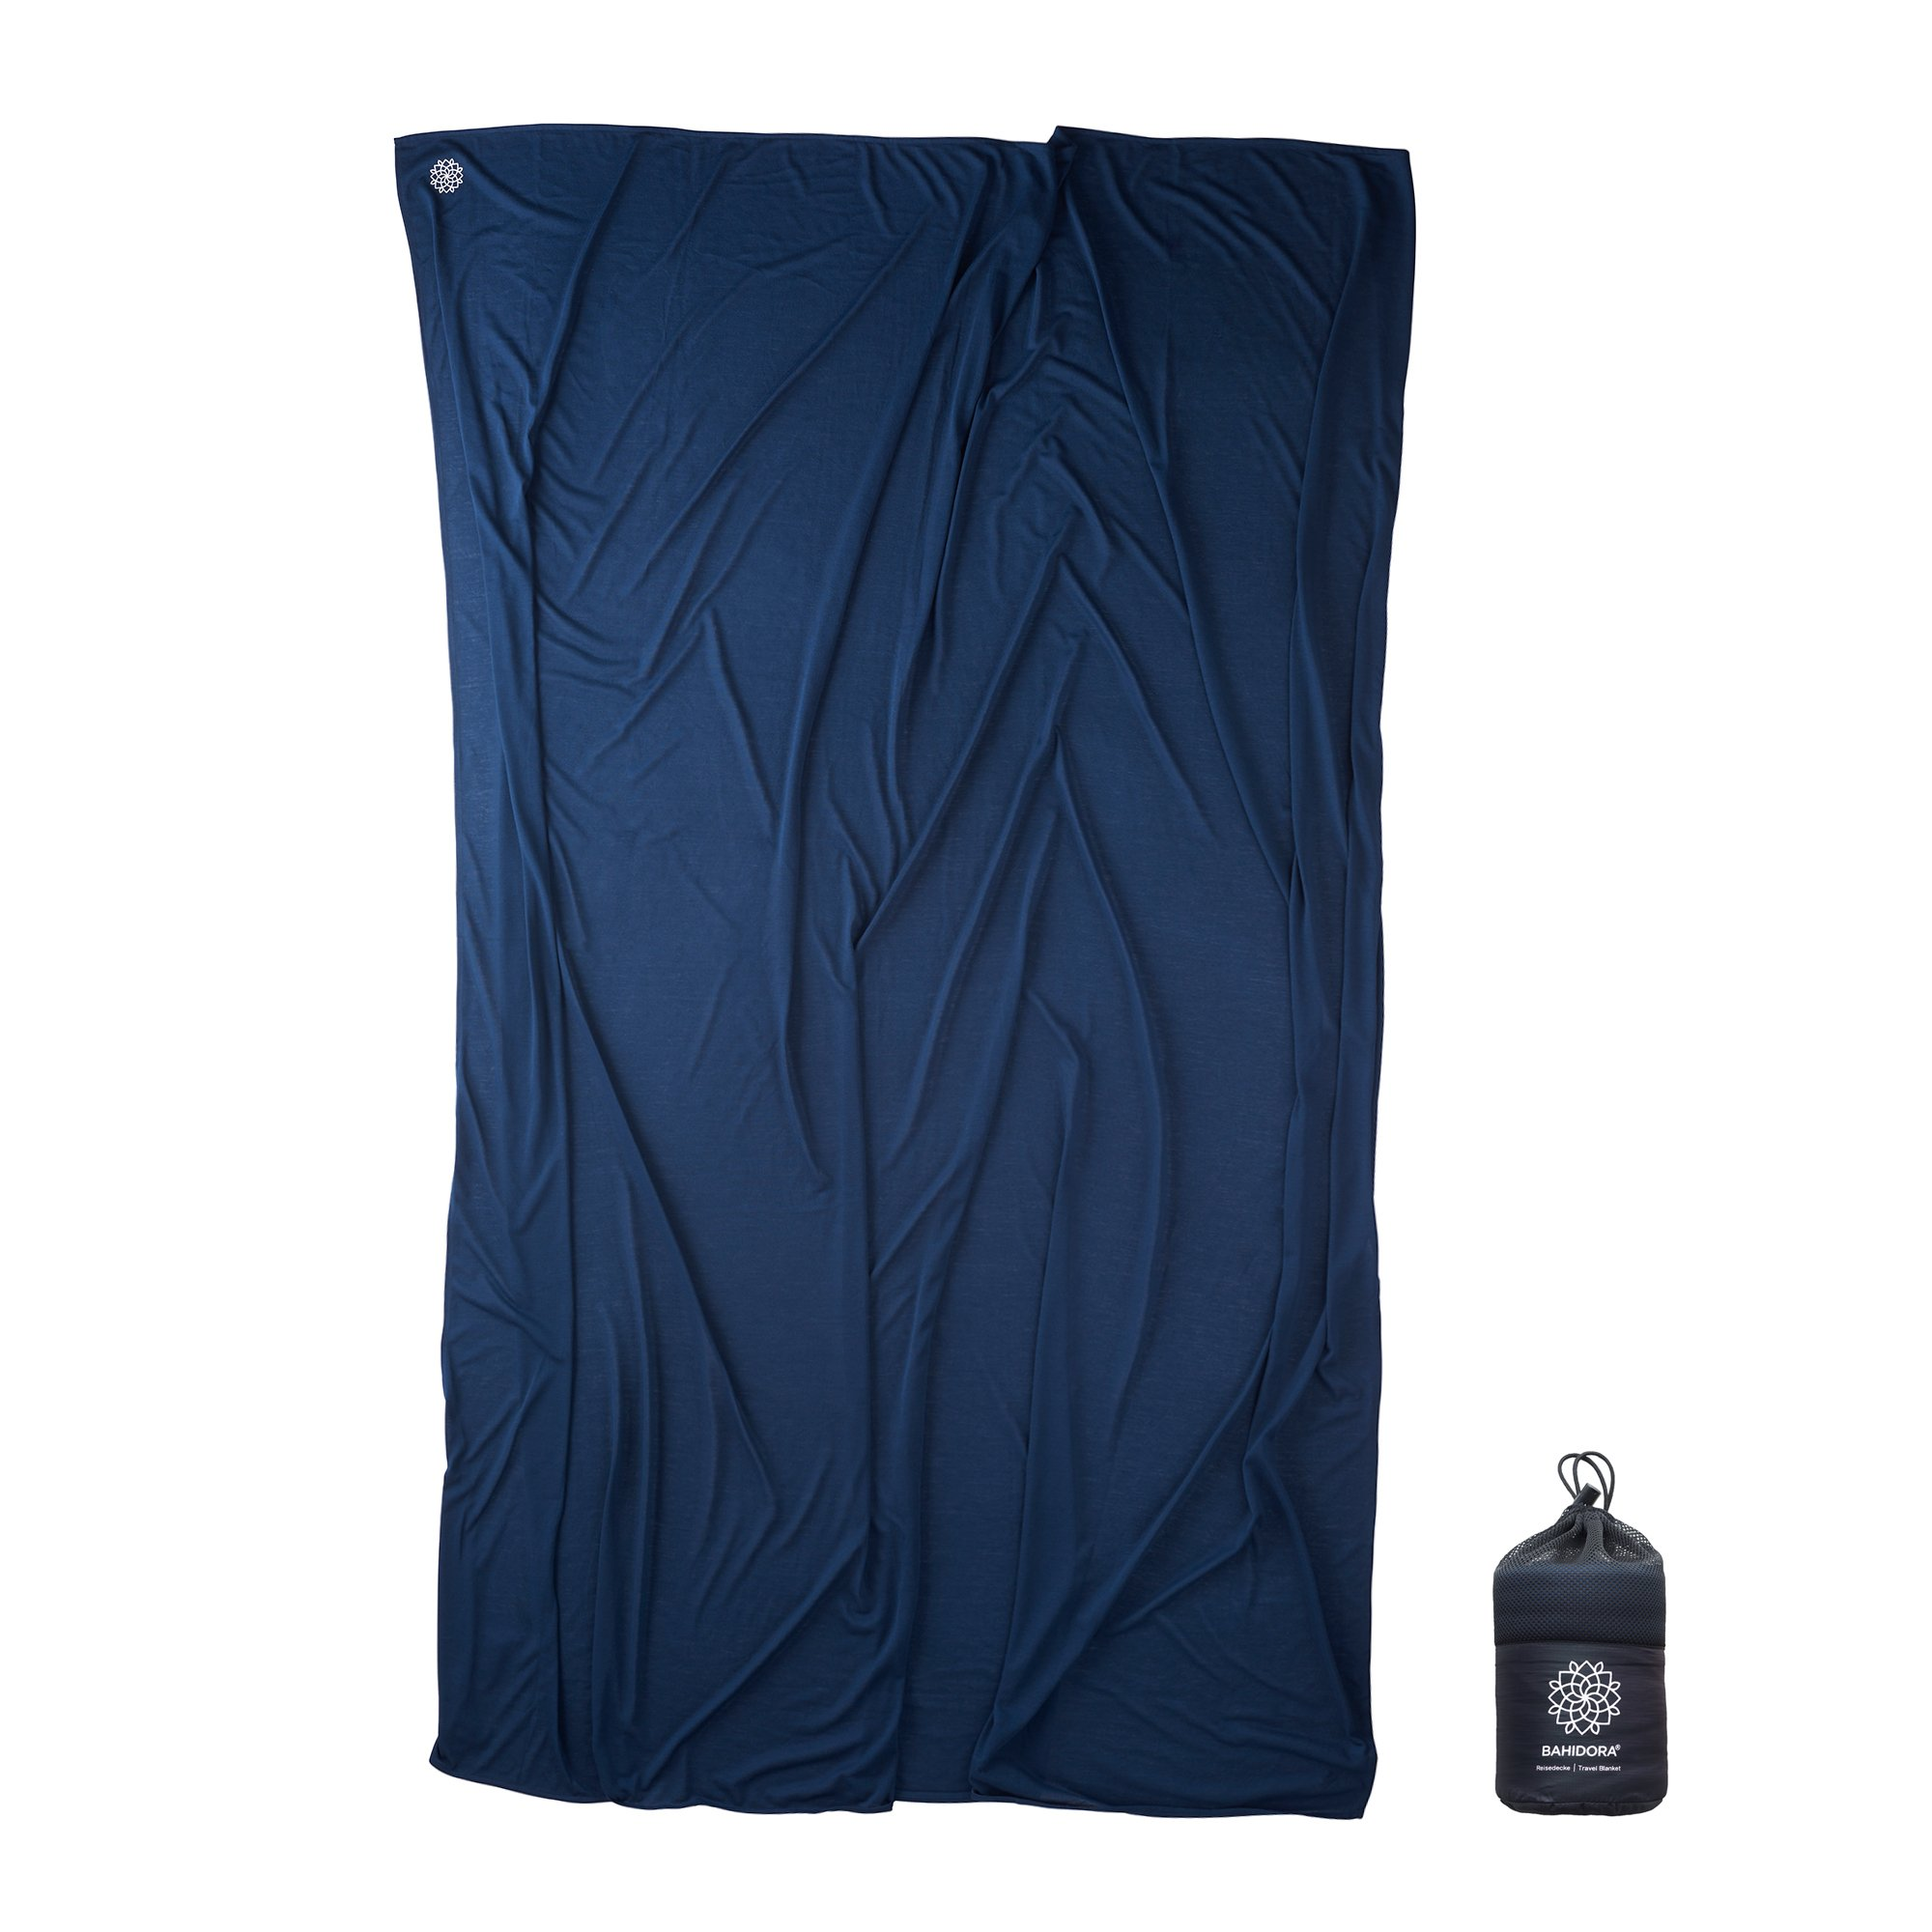 Bahidora Travel Blanket, dark blue (Blue) - BAHIDORA-0059